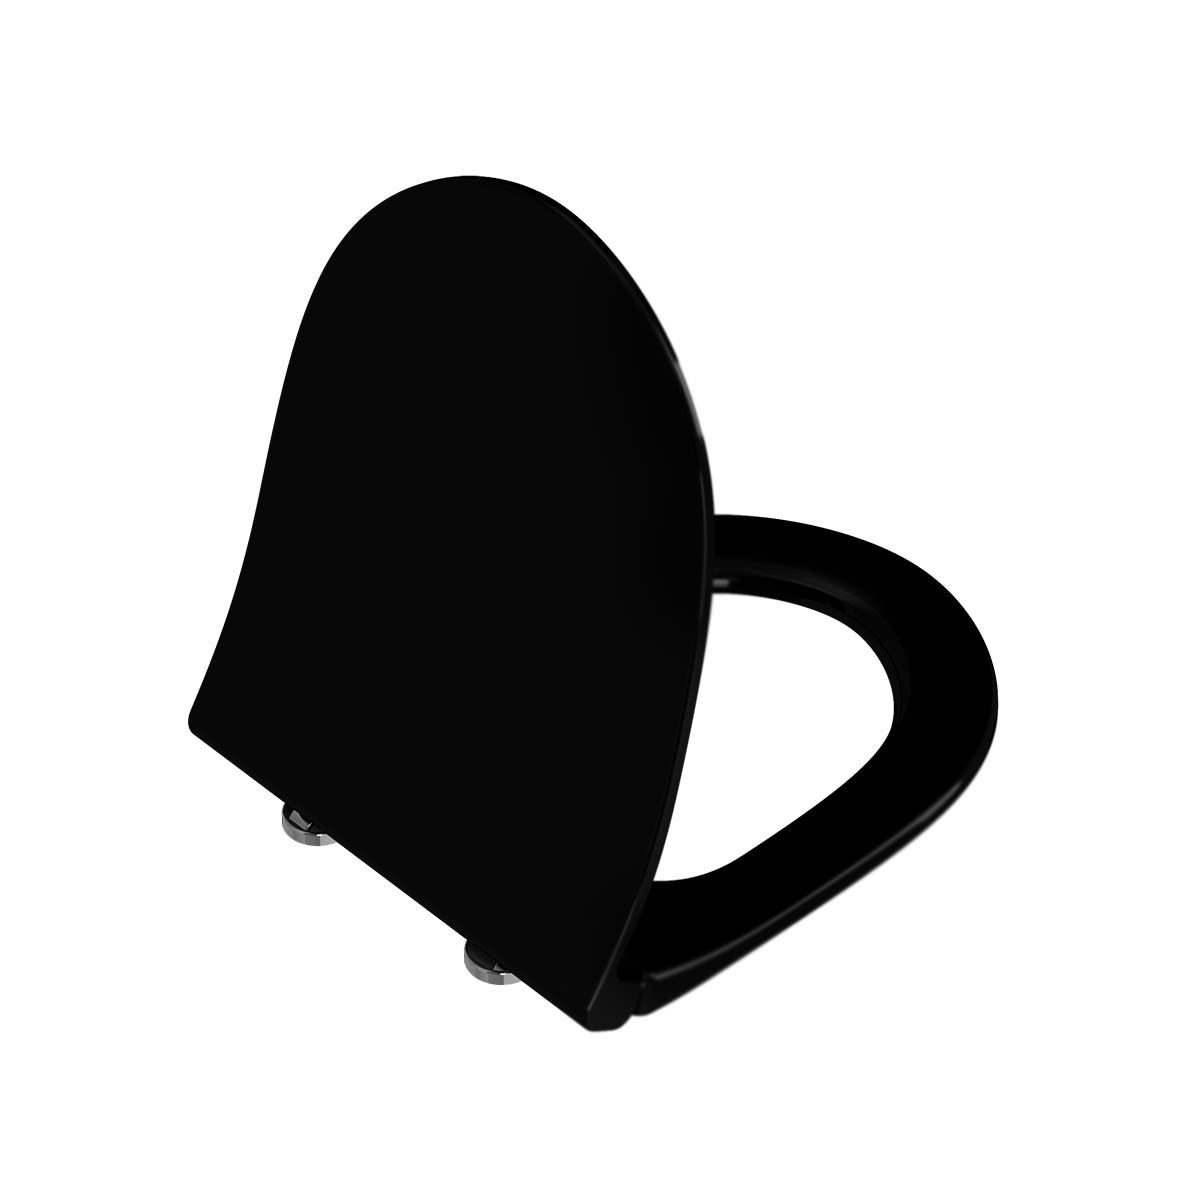 Deska Wolnoopadająca Vitra Sento czarny mat 120-083R009